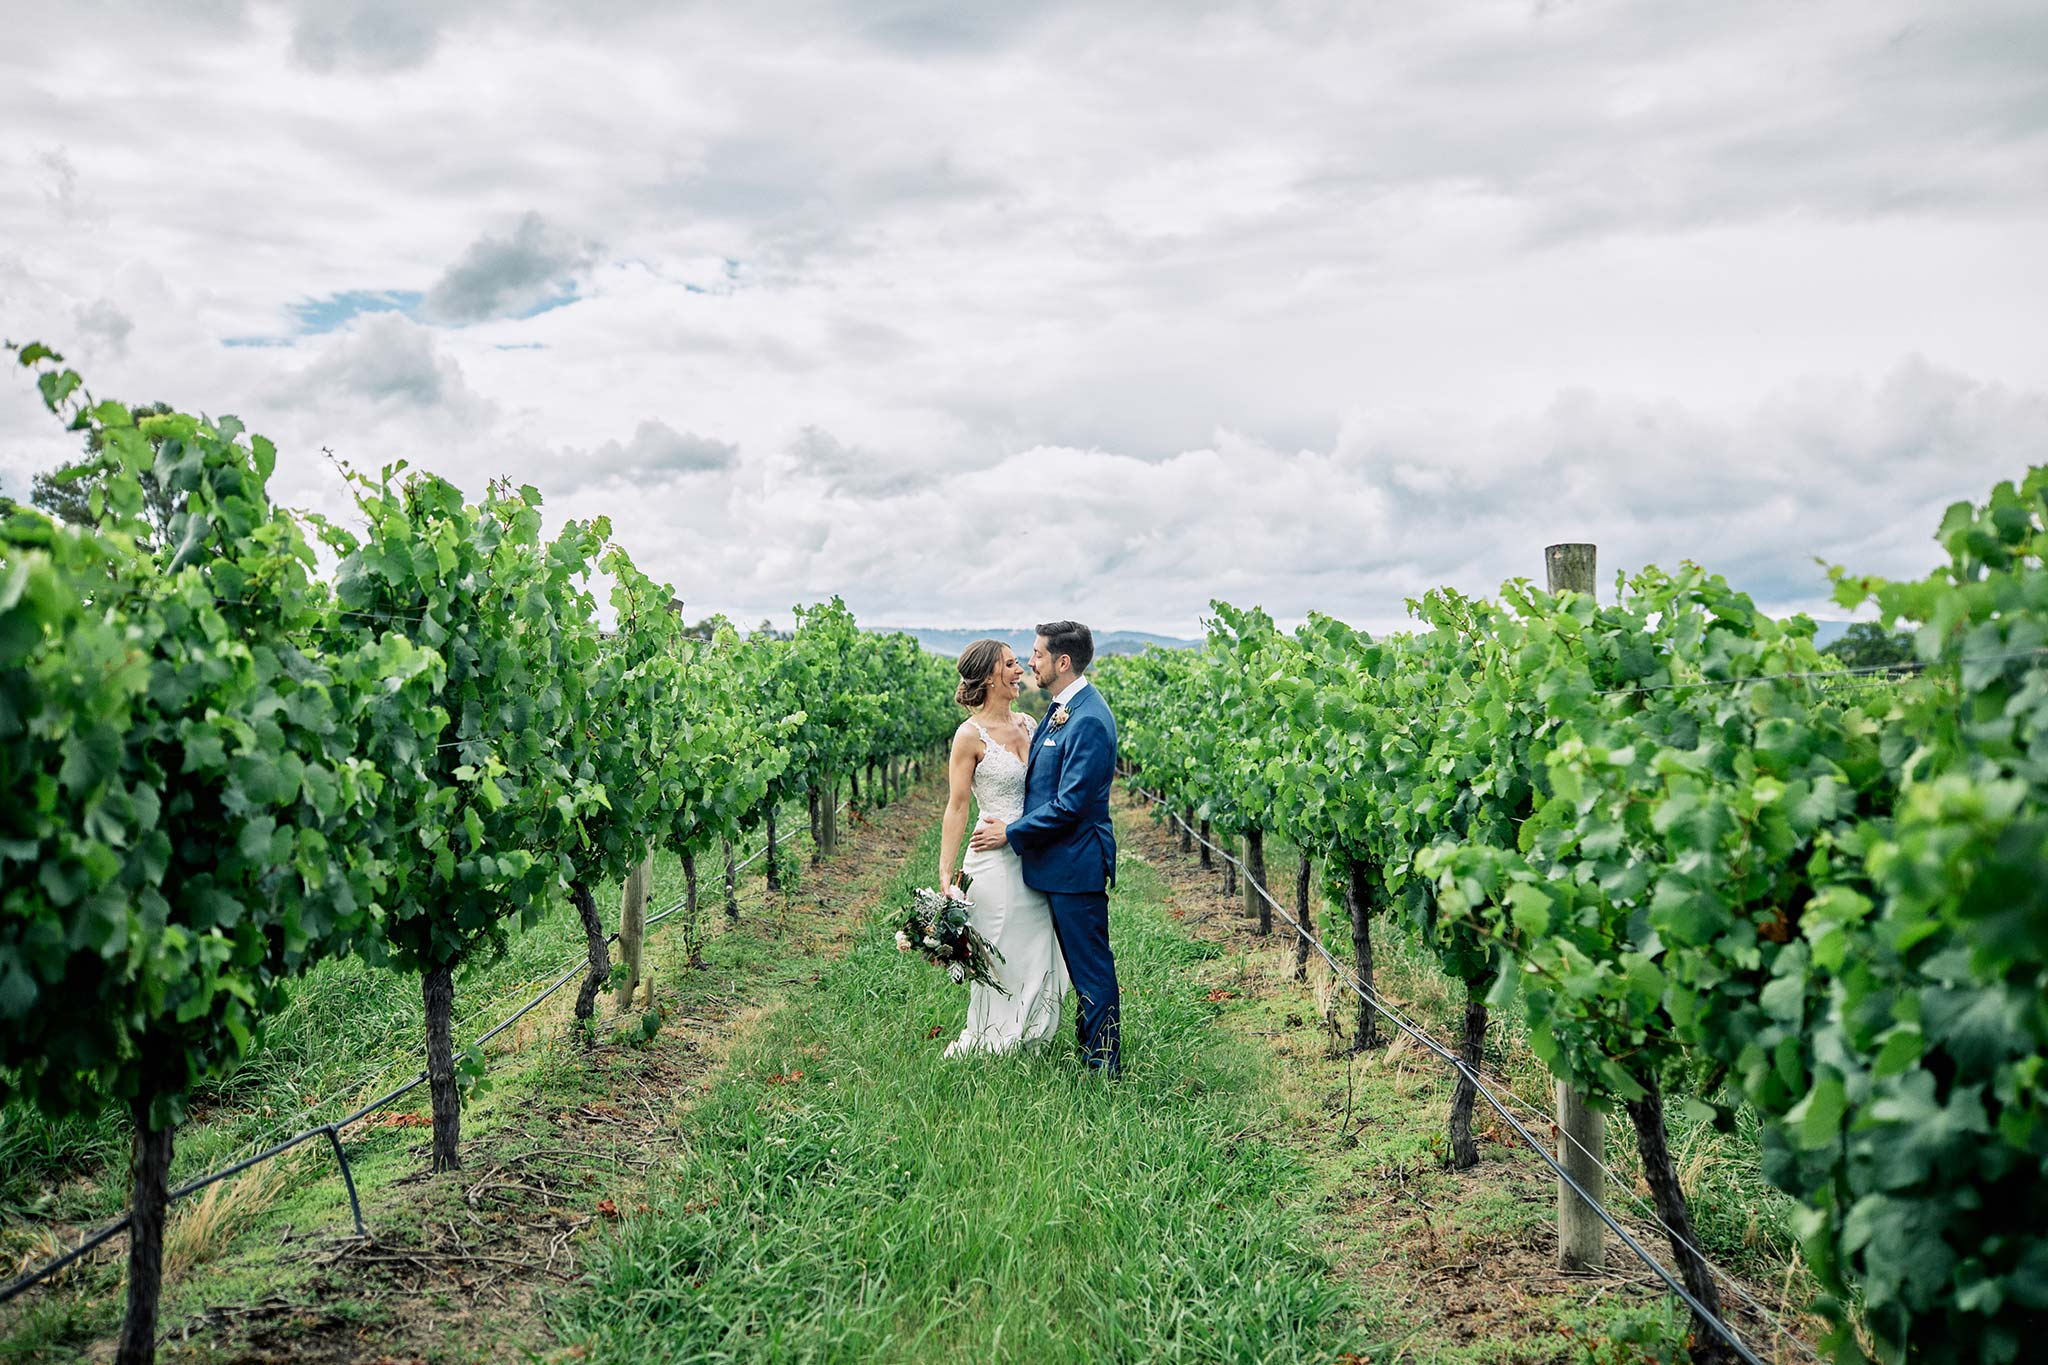 Zonzo estate wedding vineyard couple